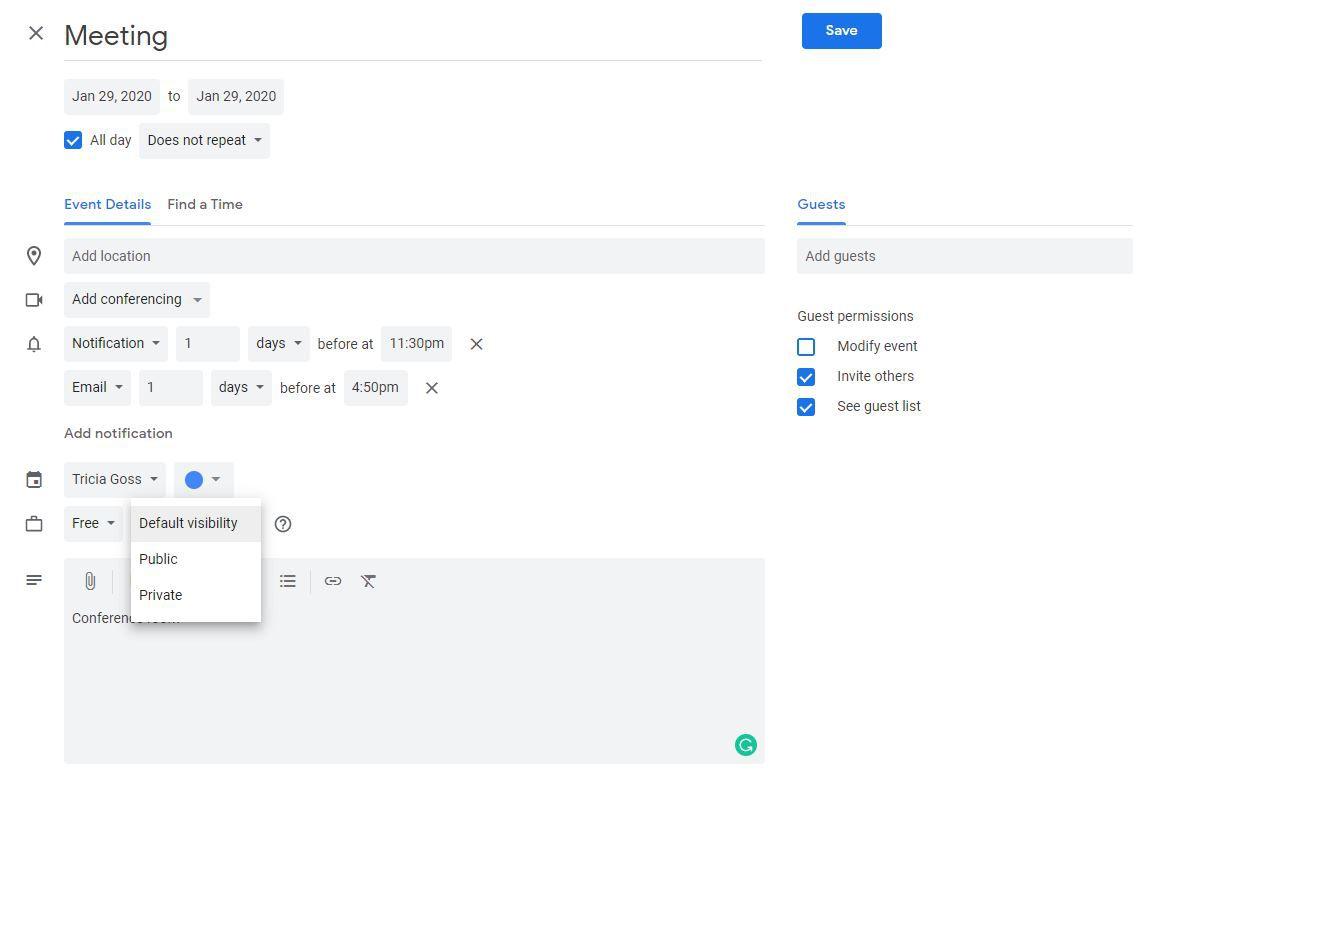 Screenshot of Privacy options in Google Calendar event